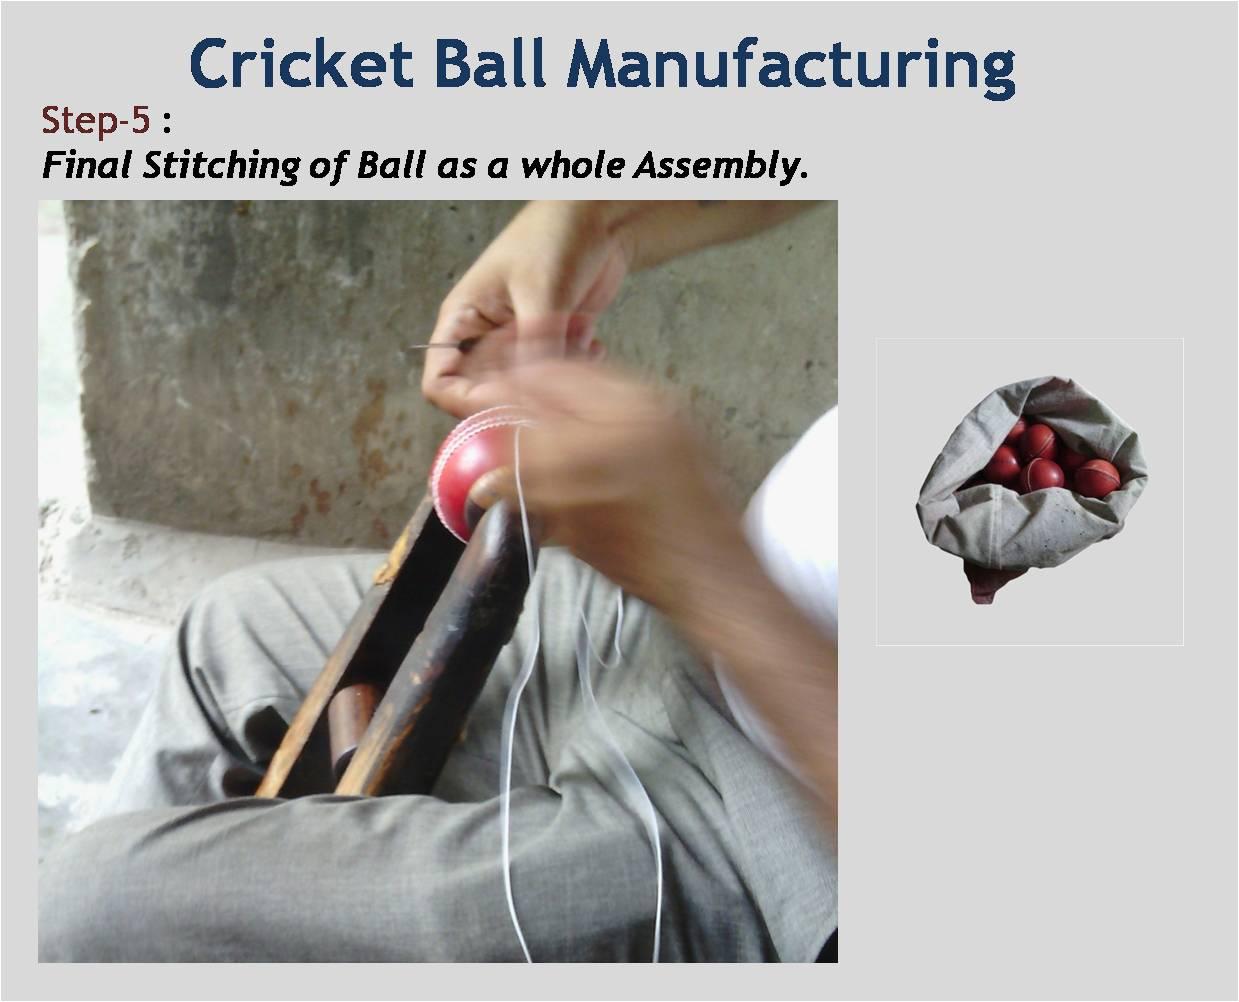 Cricket Ball Manufacturing Final Stitching of Ball